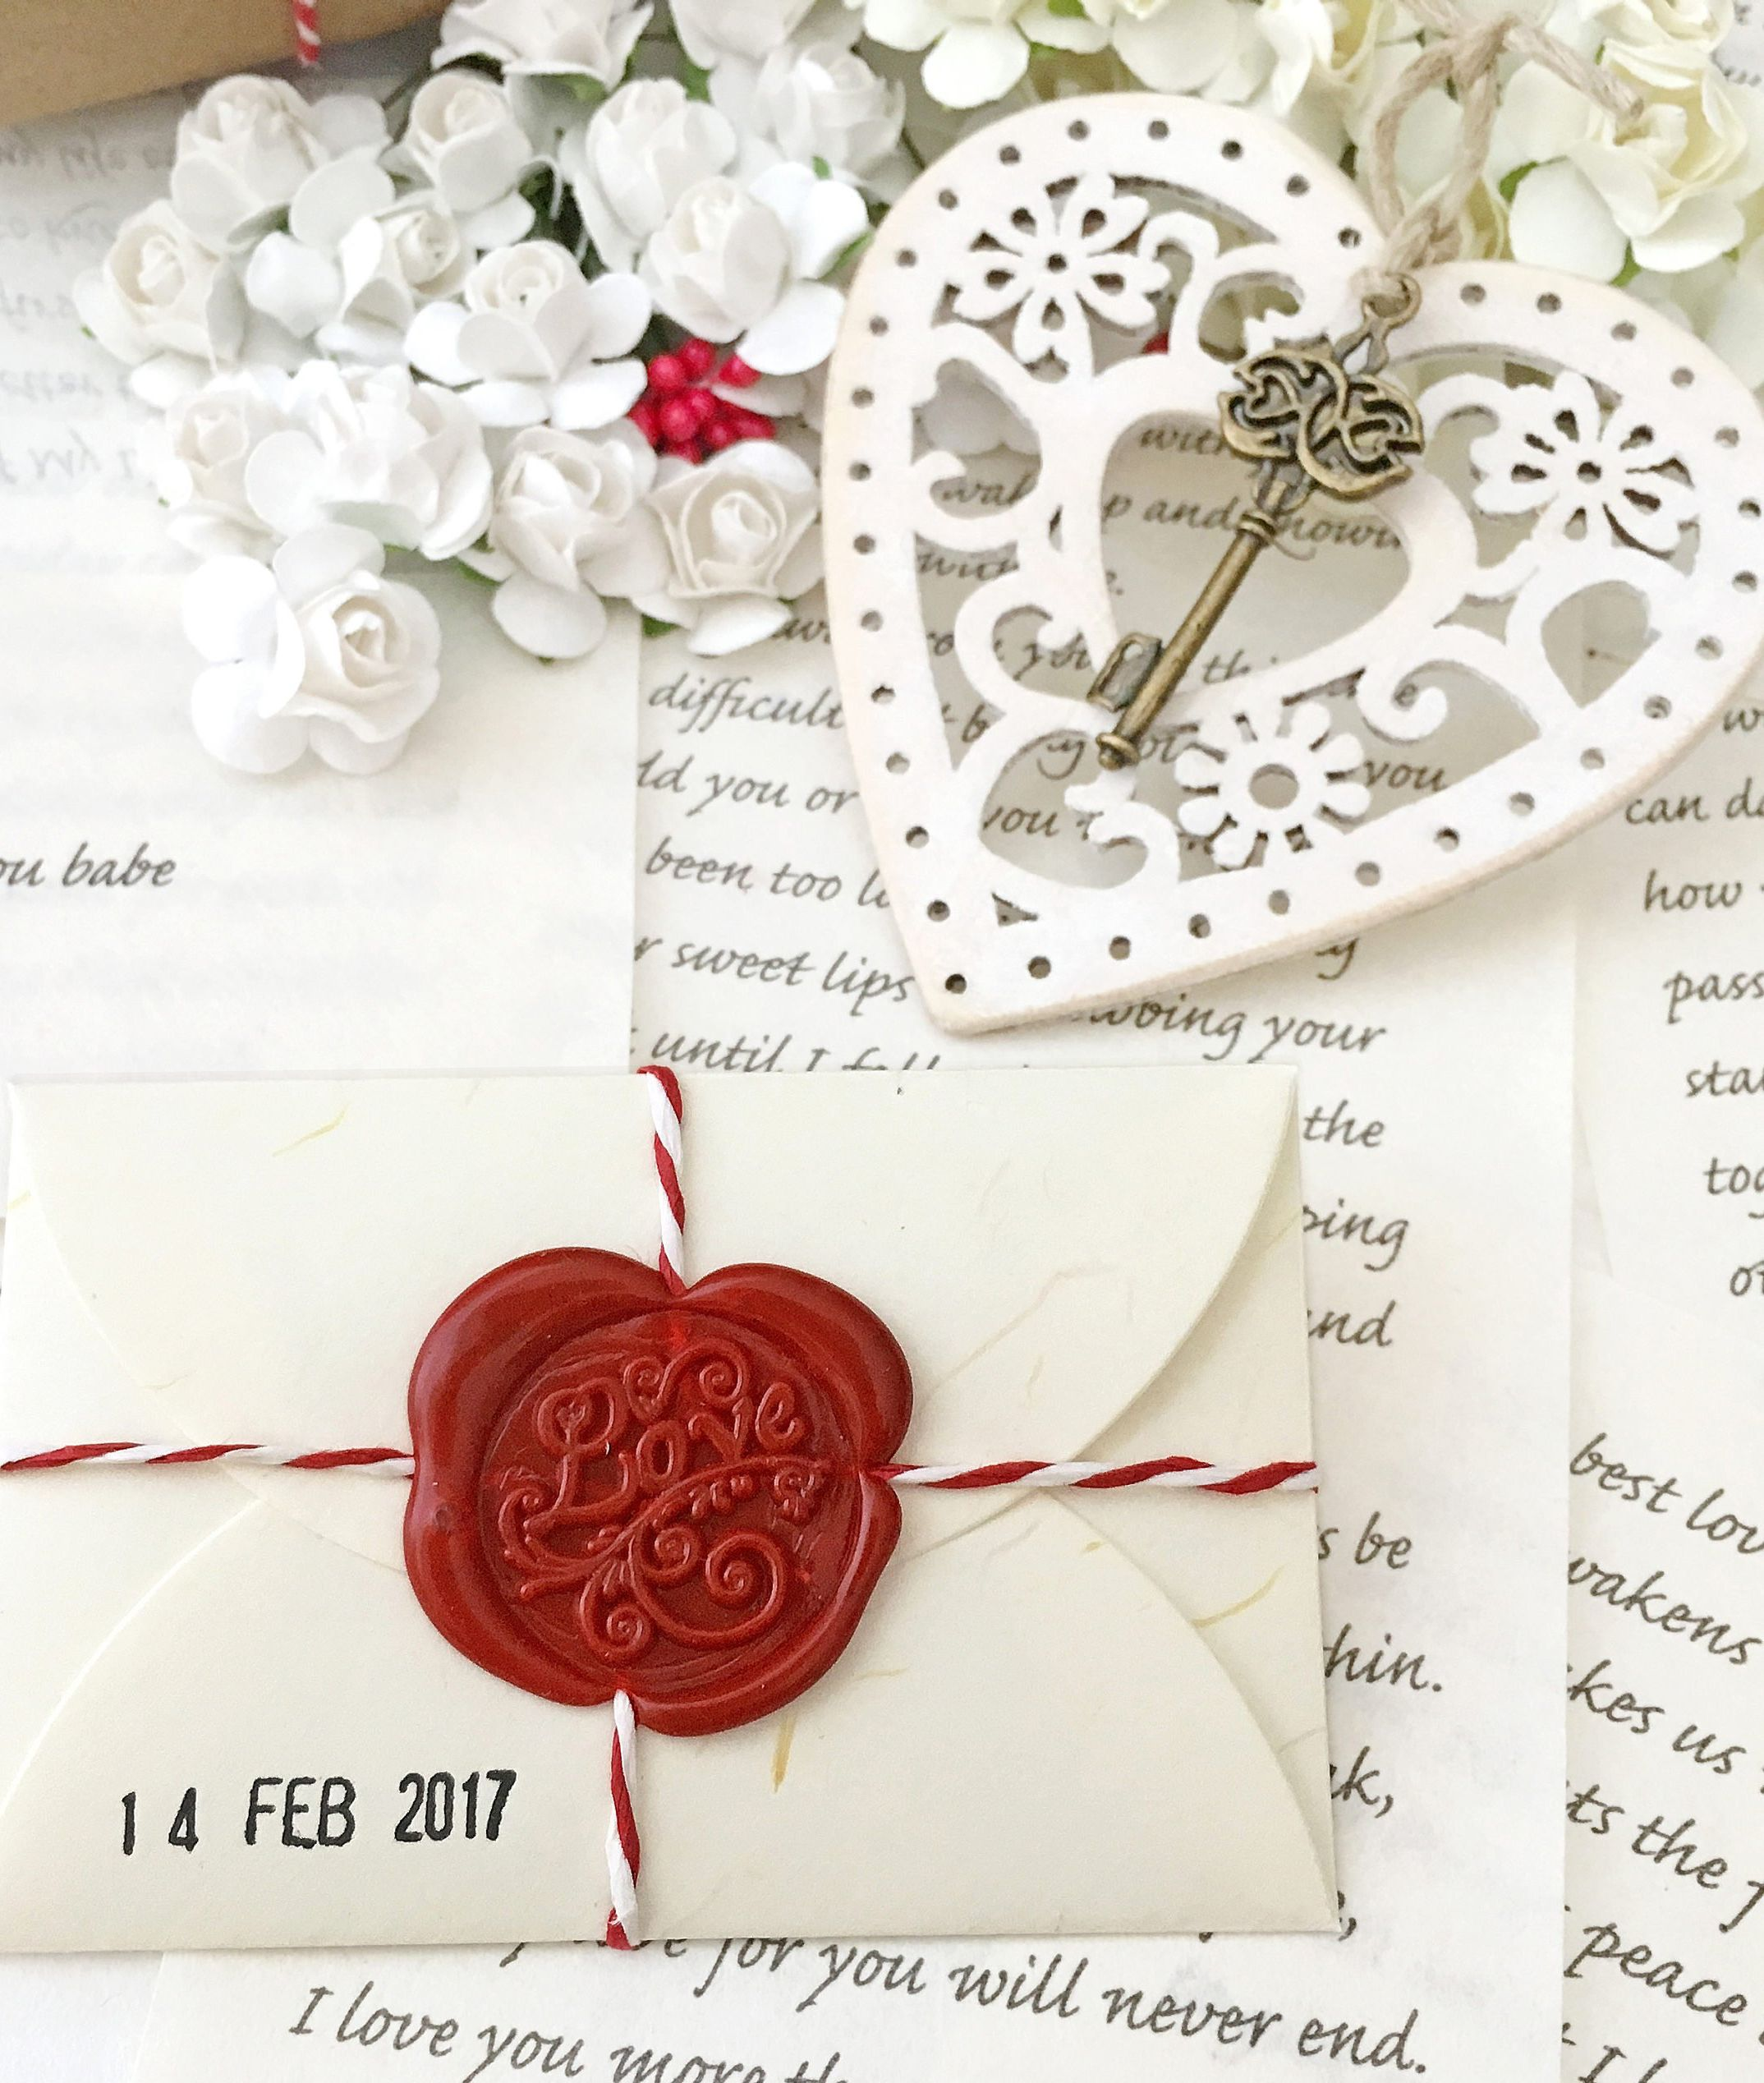 Personalised Heart Flowers Special Anniversary Gift Him Her BoyFriend GirlFriend